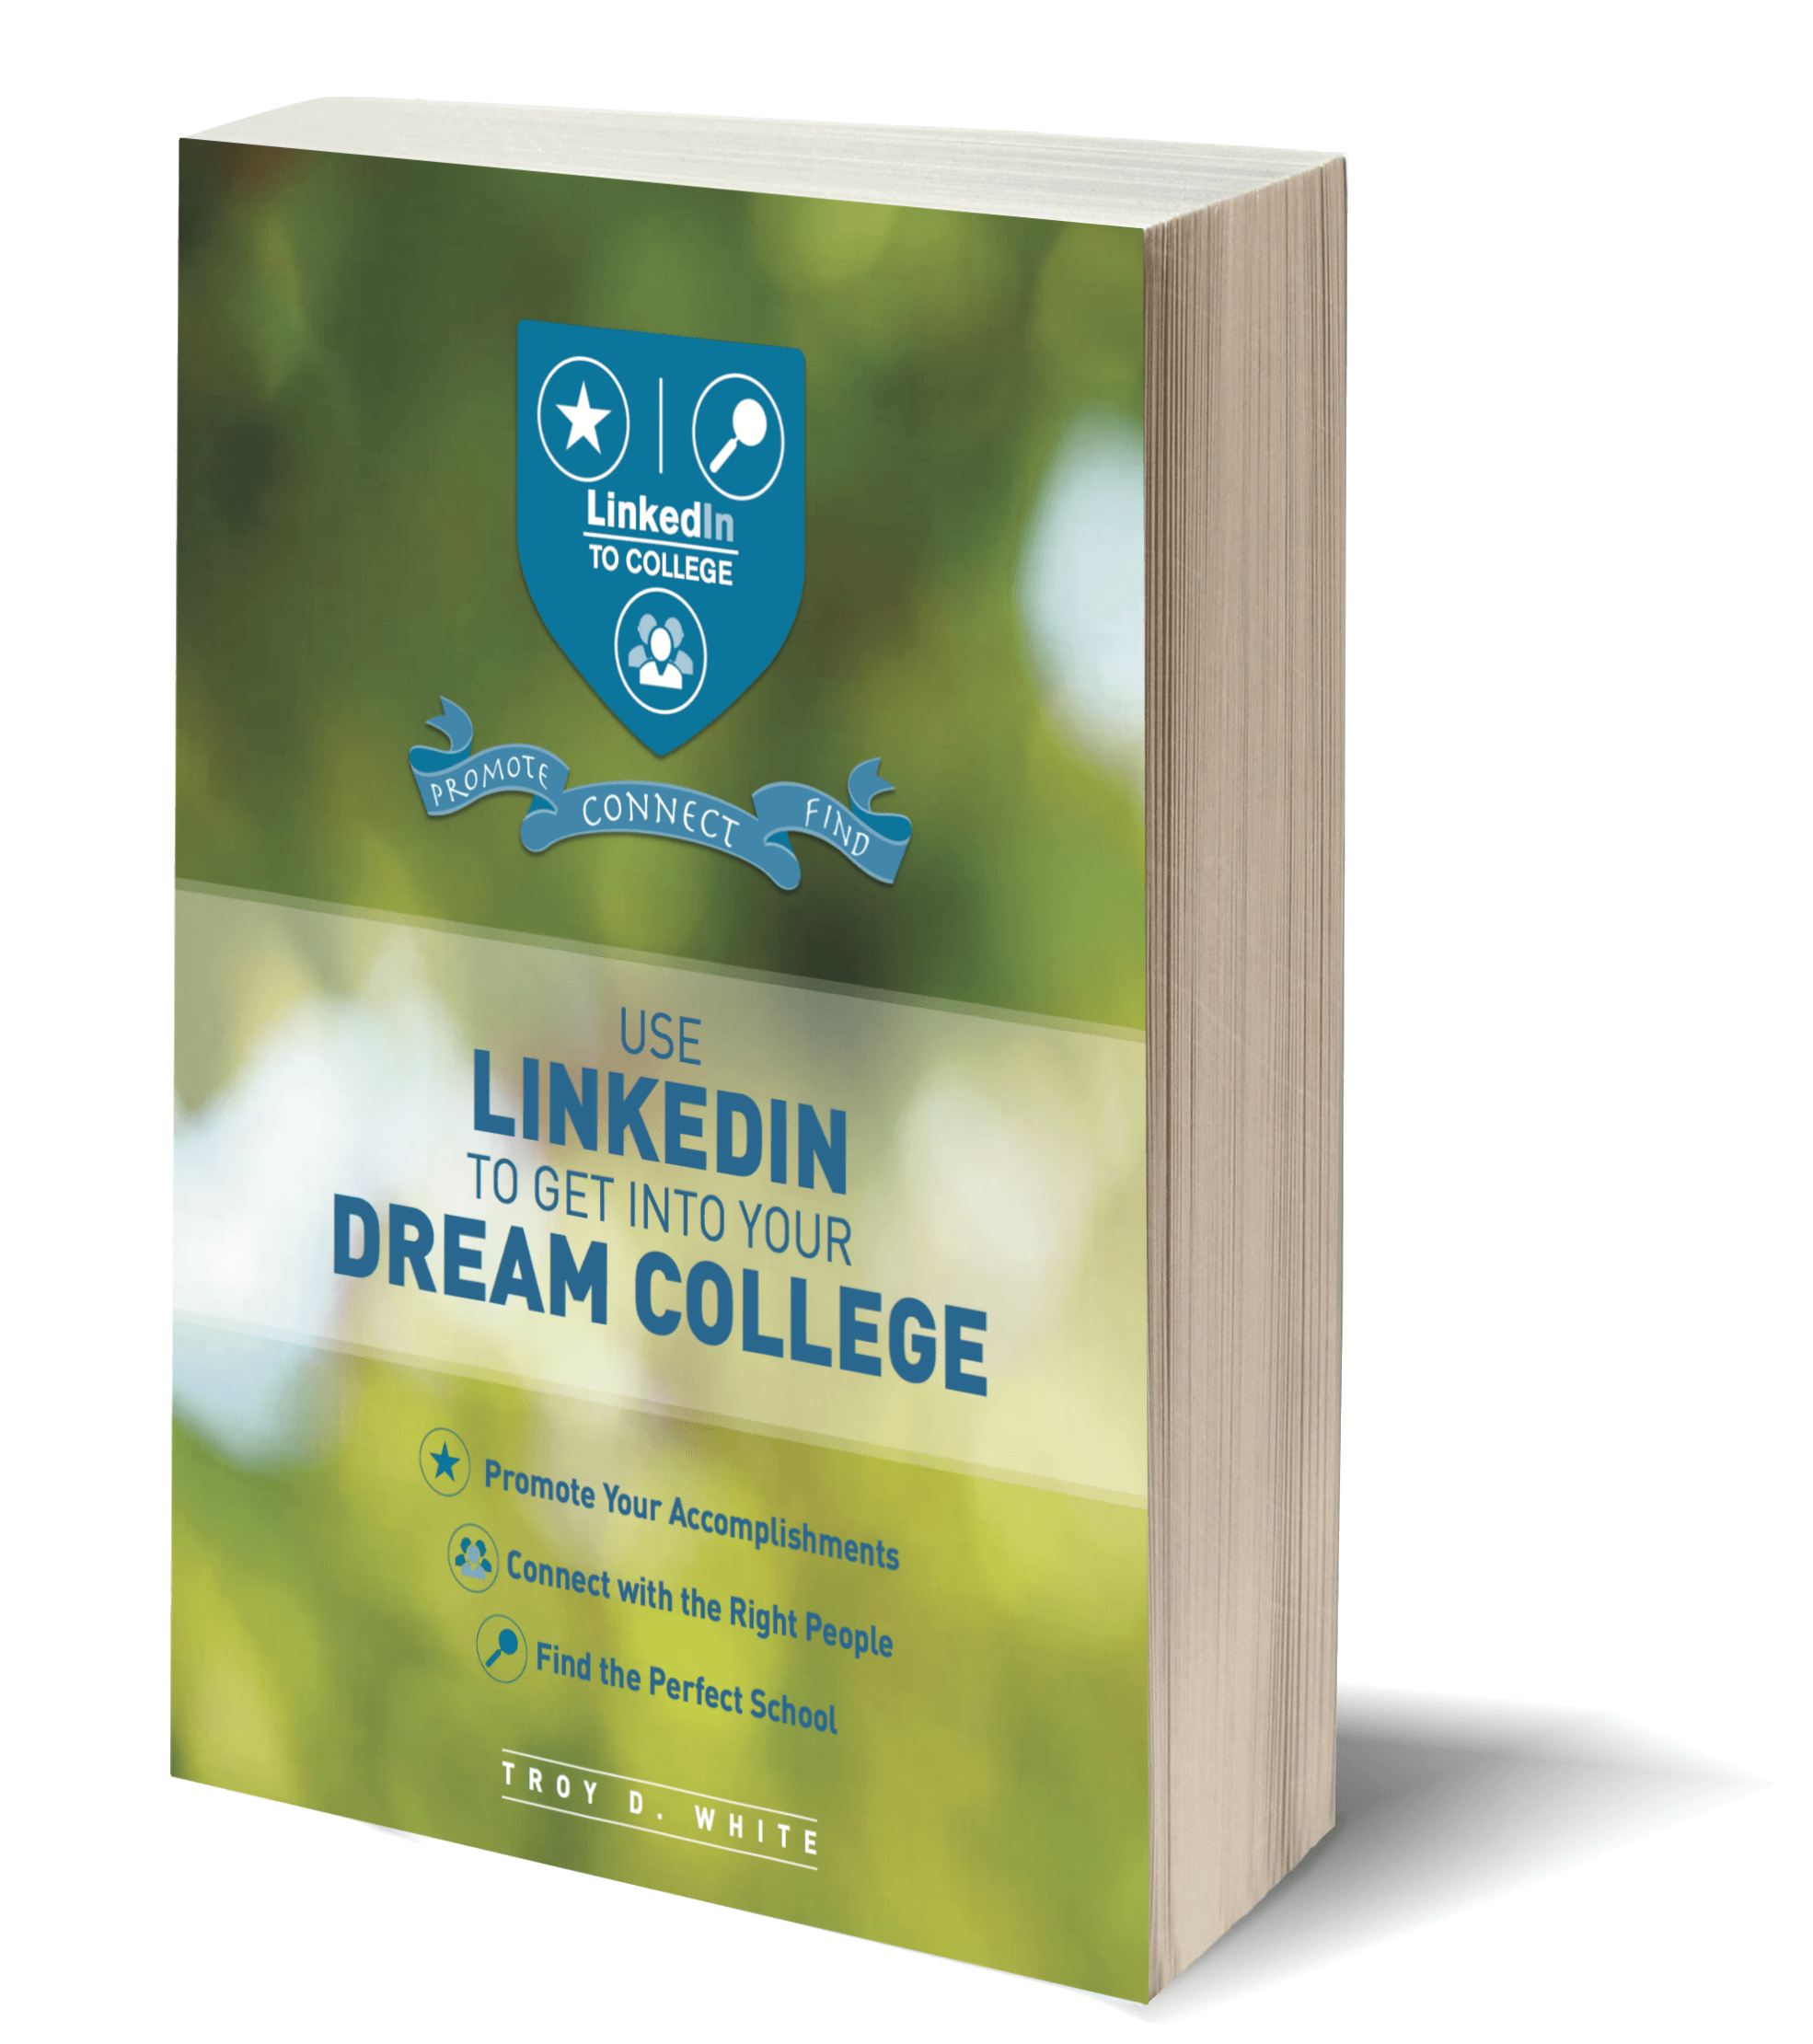 Download a FREE LinkedIn E-book • LinkedIn to College